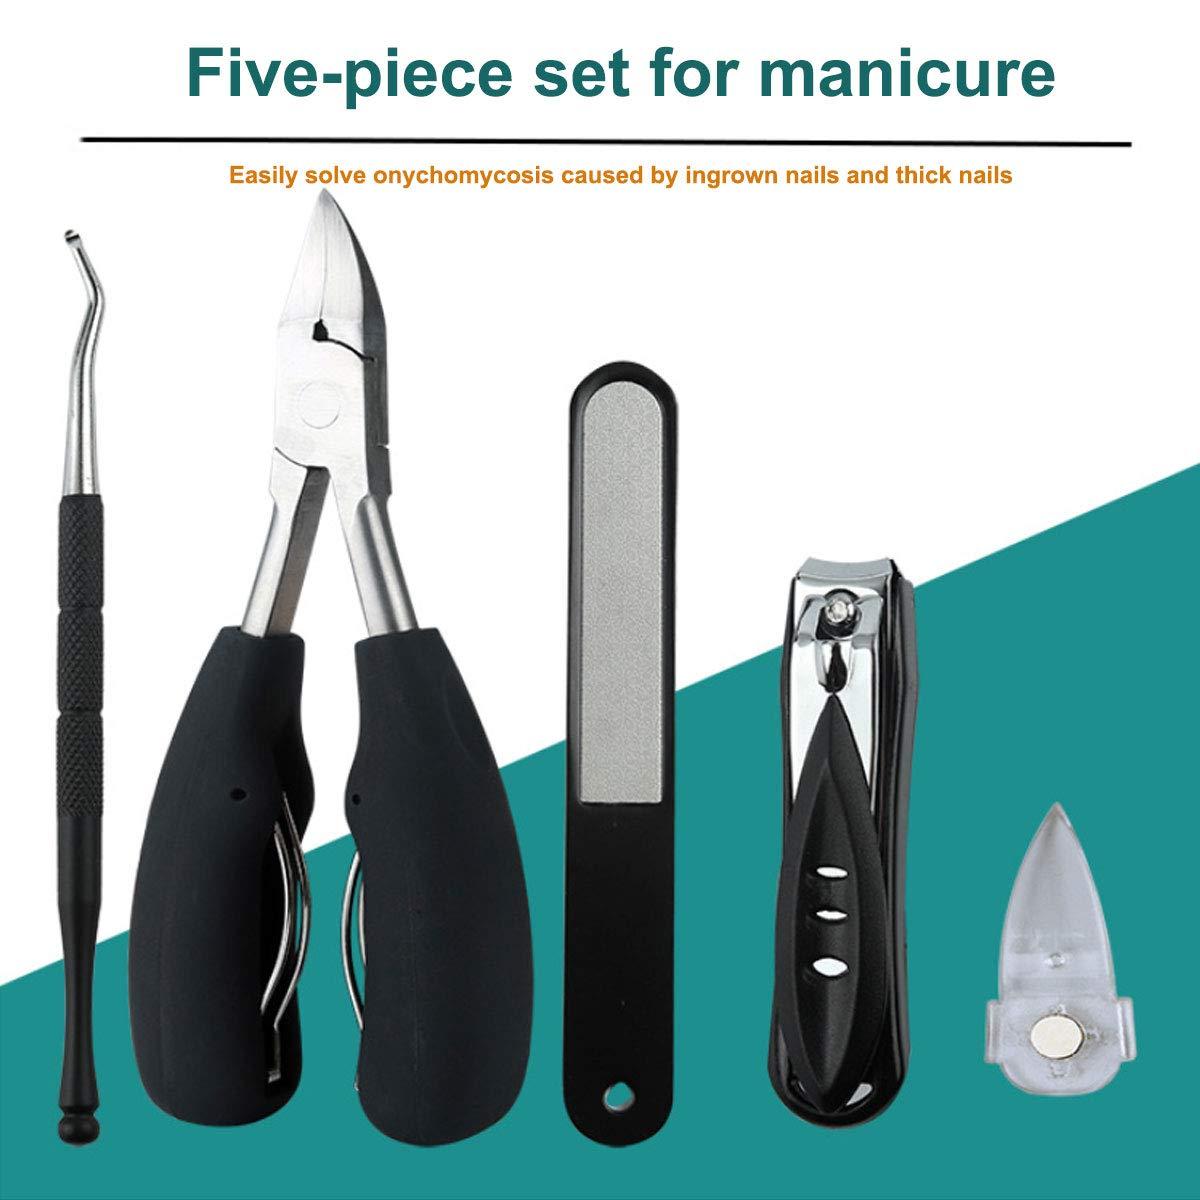 Adofect 5 PCS Toenail Clipper Professional Toenail Cutter Trimmer Set for Ingrown or Thick Toenails, Podiatrist Toenail Tools: Beauty